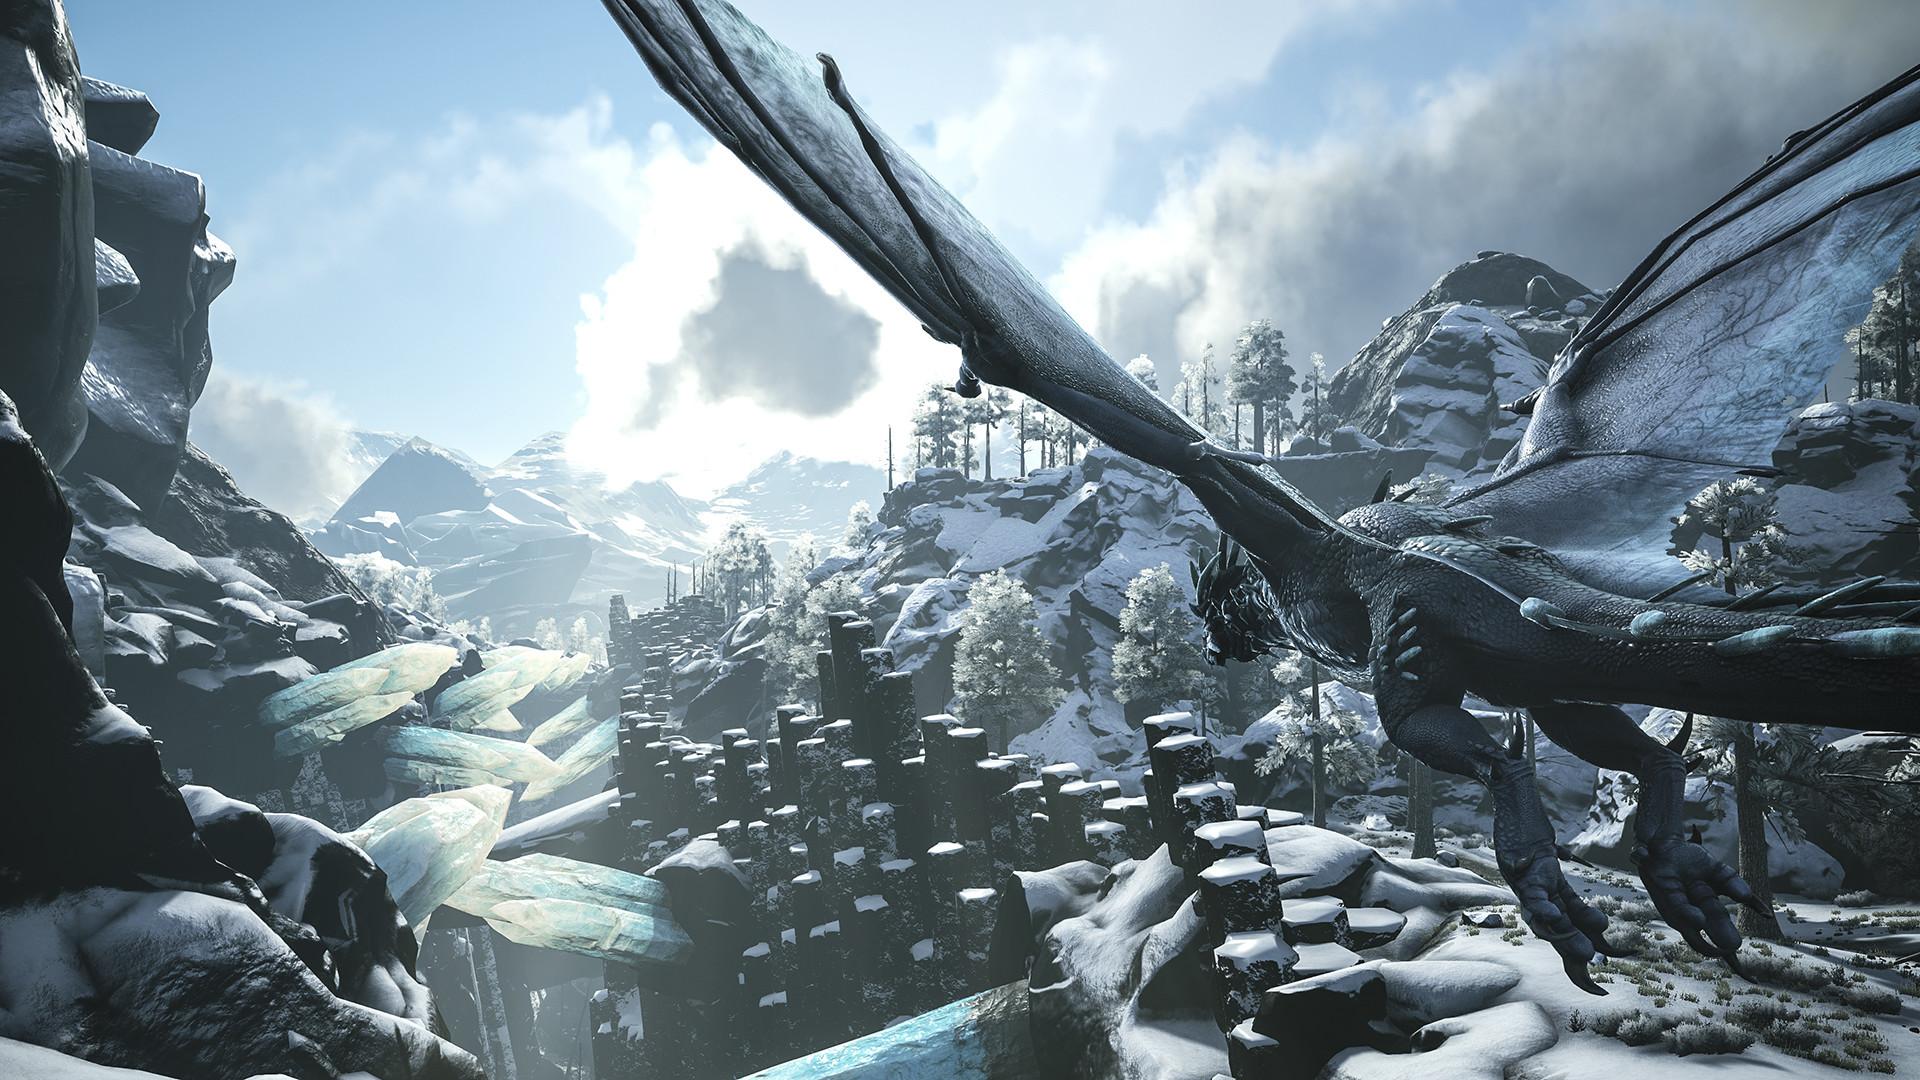 Ark Karte Valguero.Valguero Ark Expansion Map On Steam